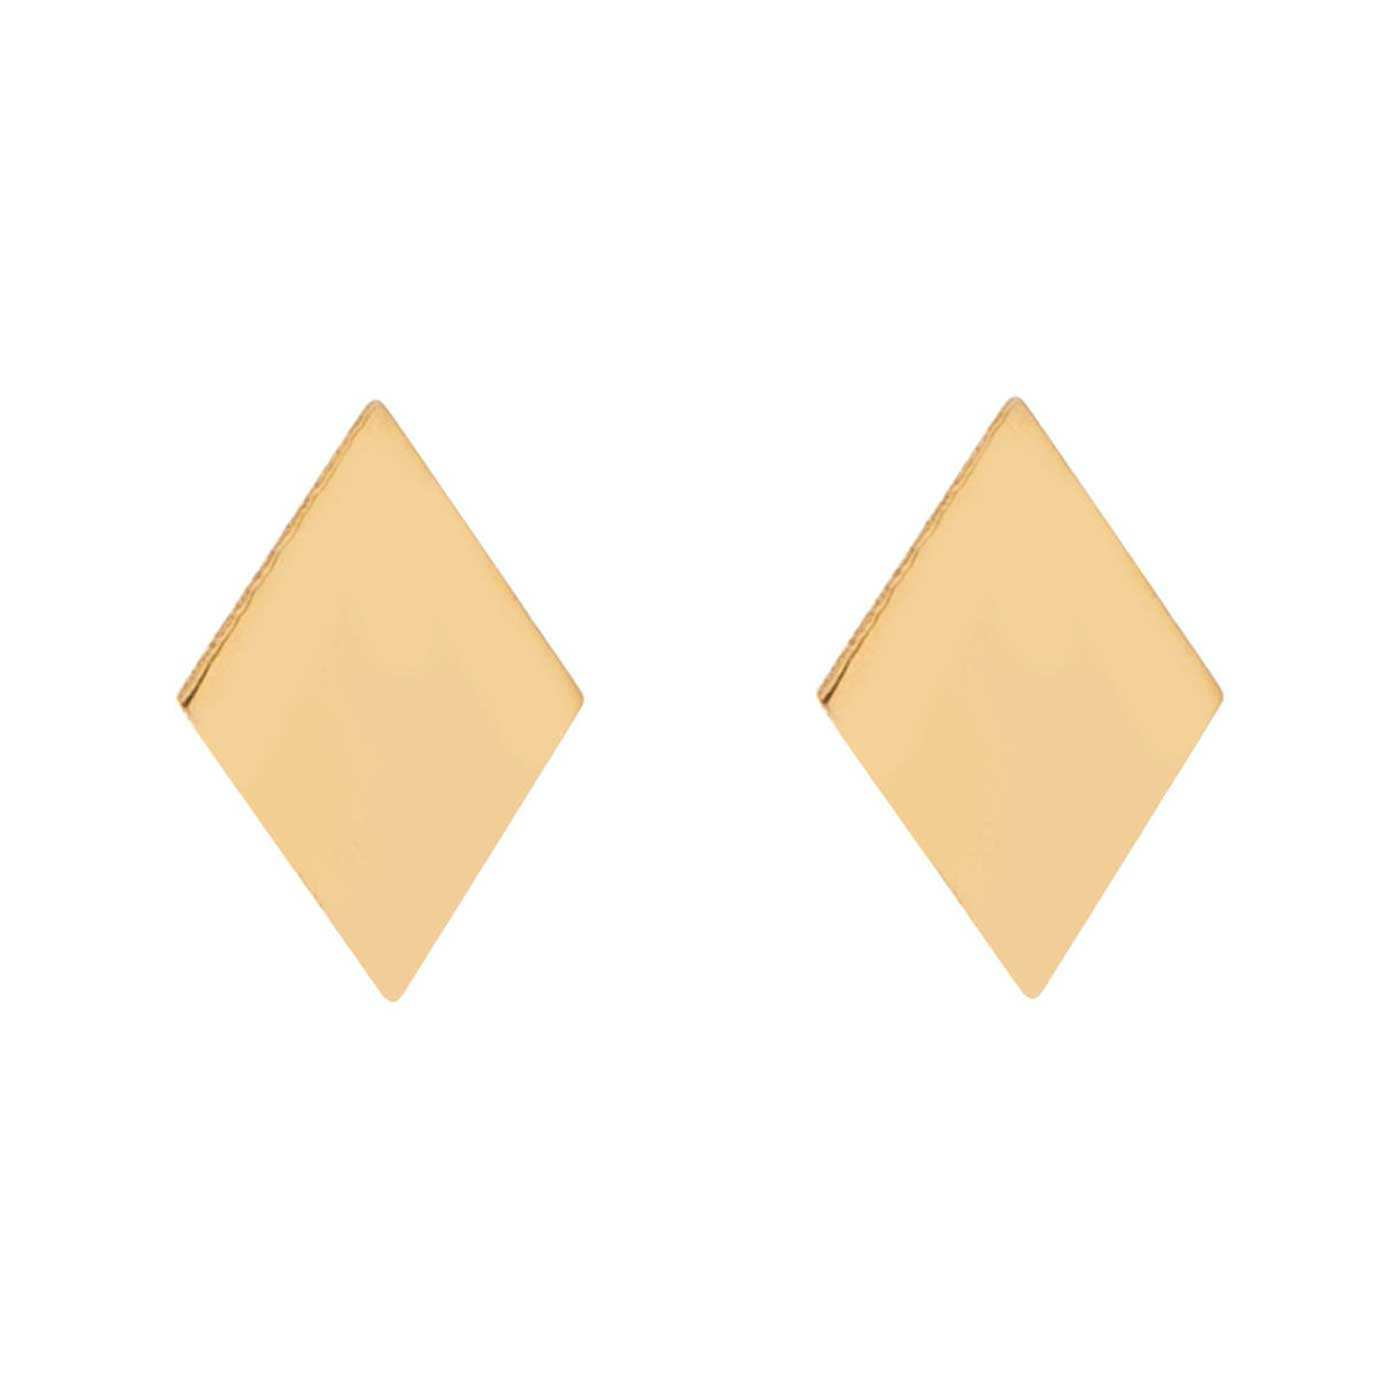 گوشواره طلا 18 عیار زنانه کانیار گالری کد GOA102 -  - 3